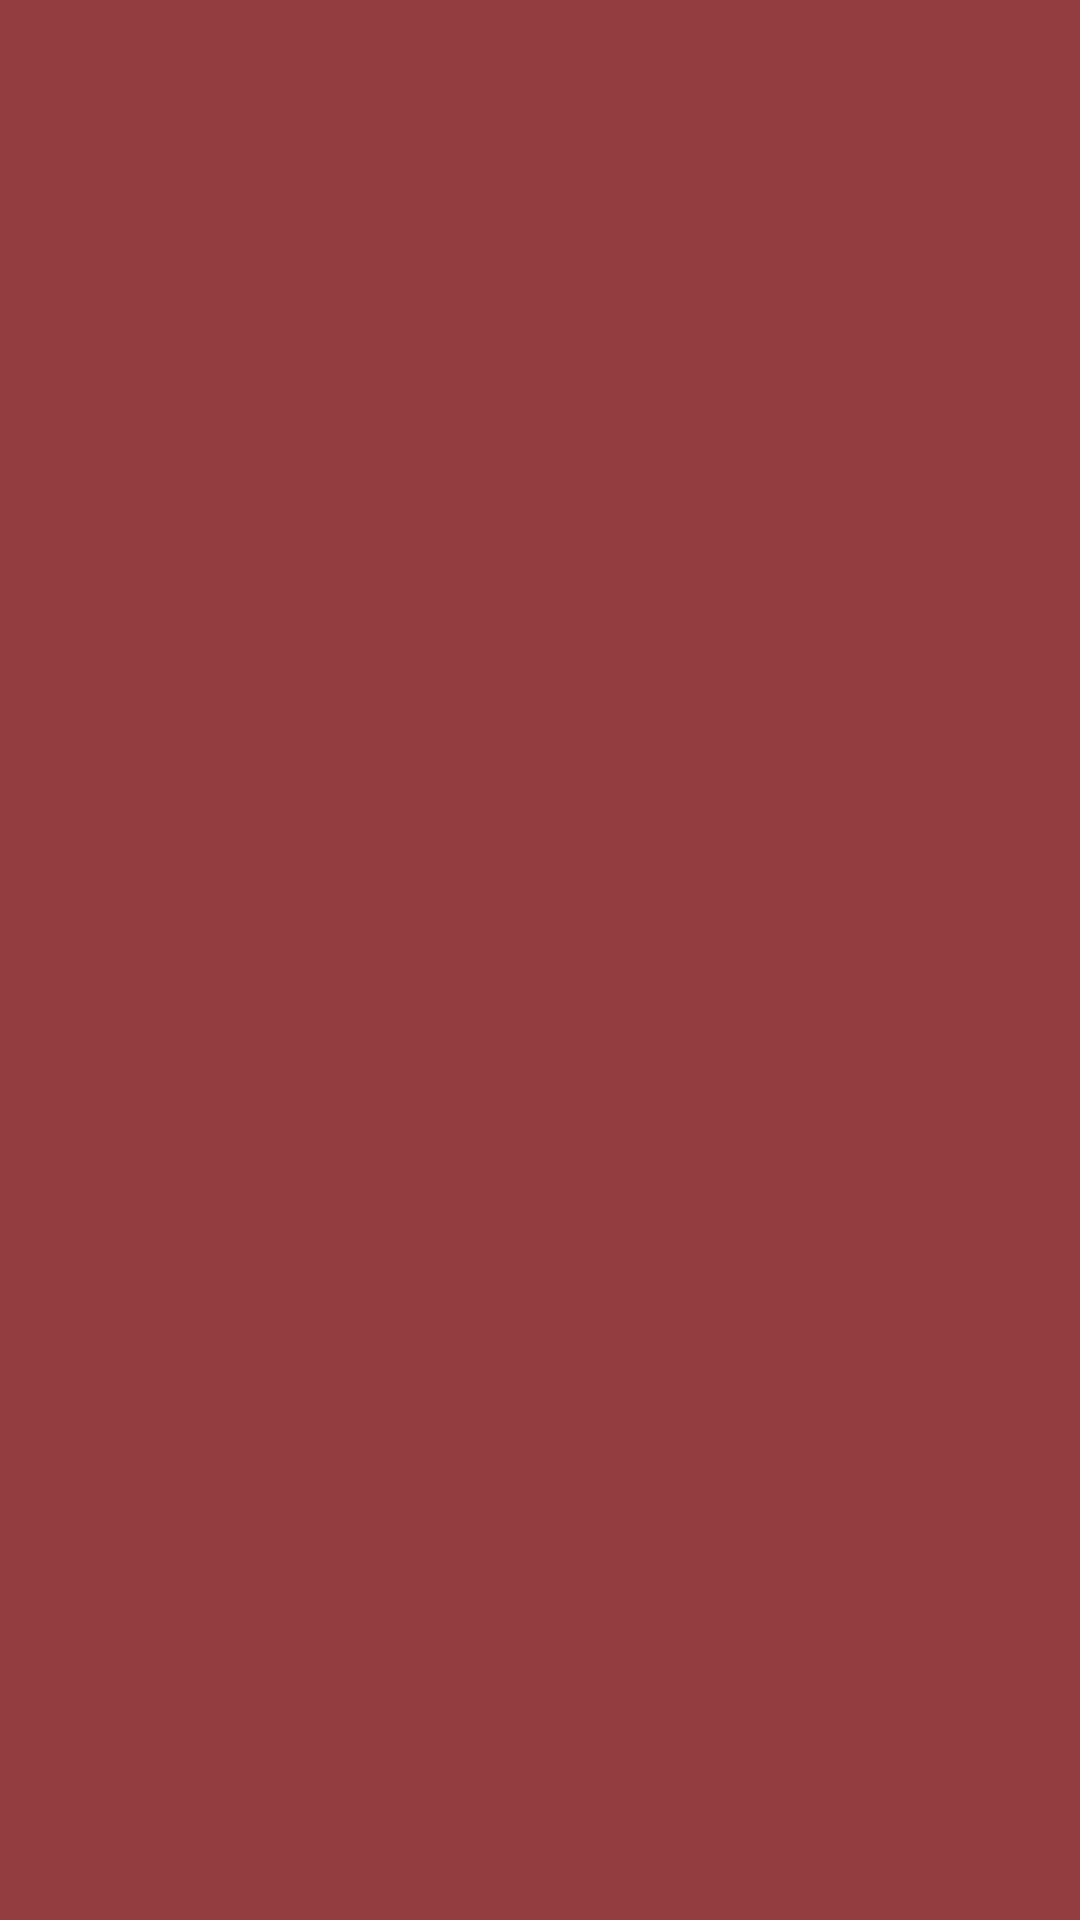 1080x1920 Smokey Topaz Solid Color Background